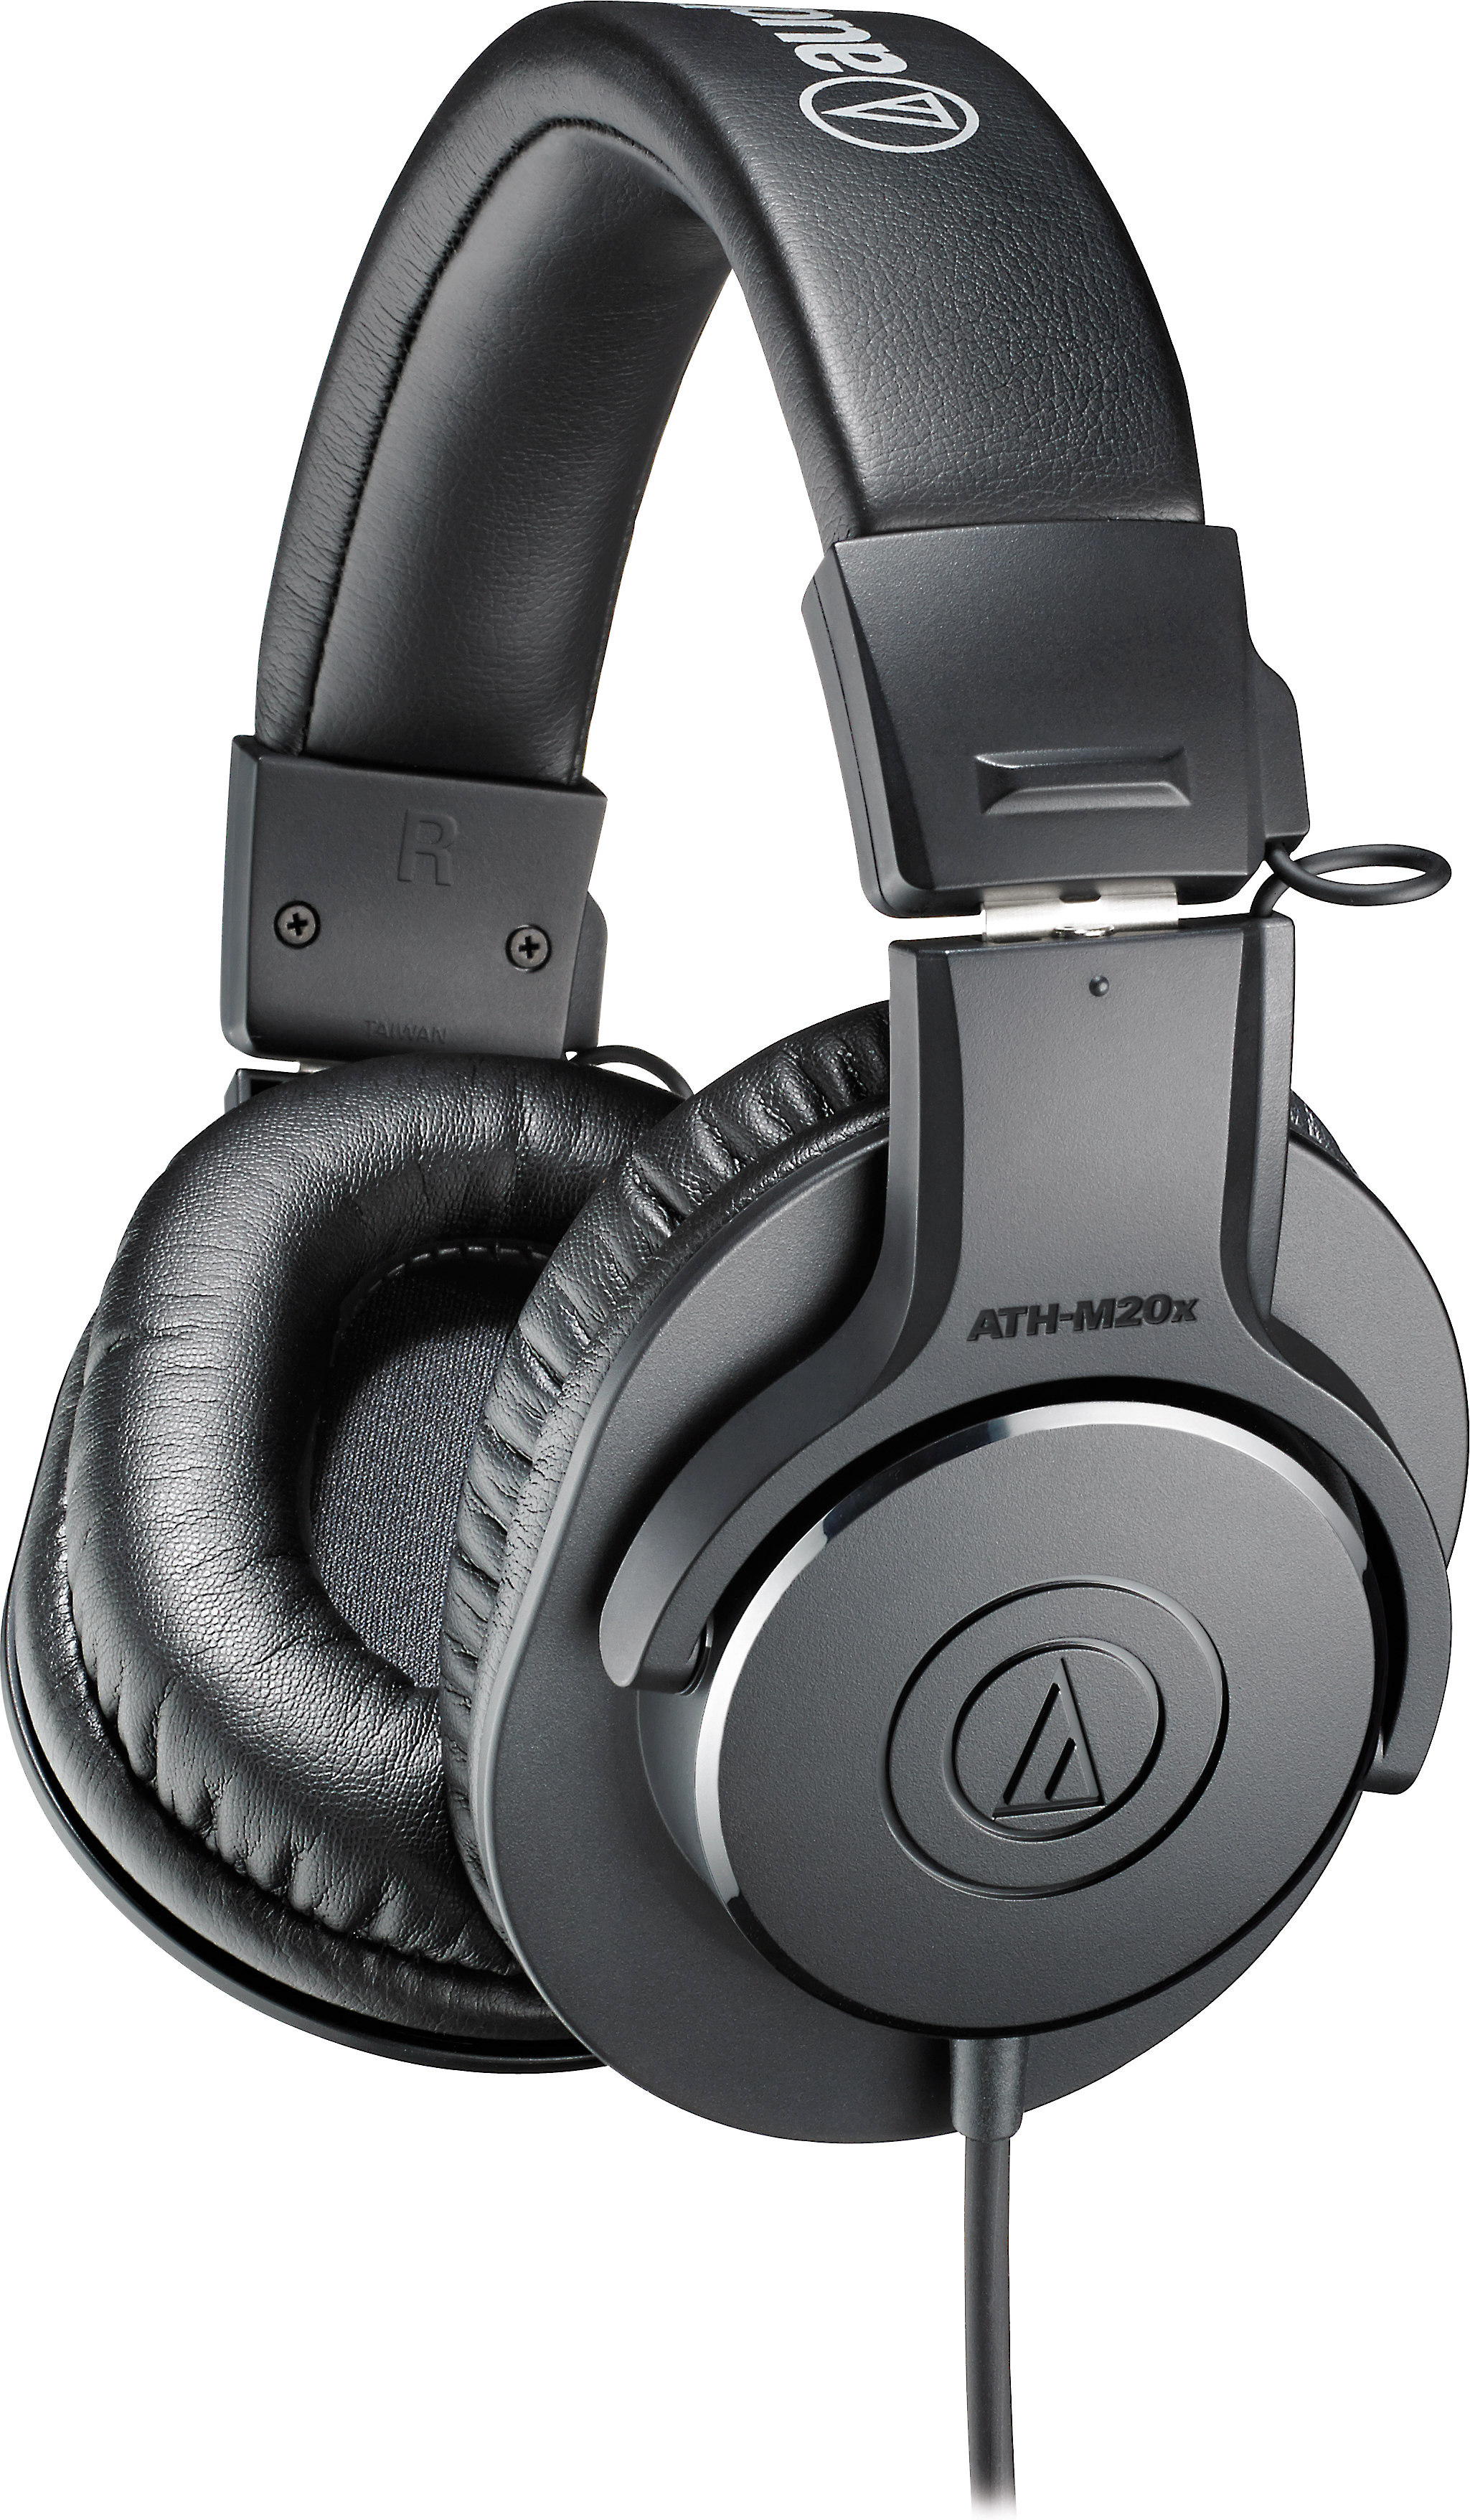 ed2a62f873b Audio-Technica ATH-M20x Professional monitor headphones at Crutchfield